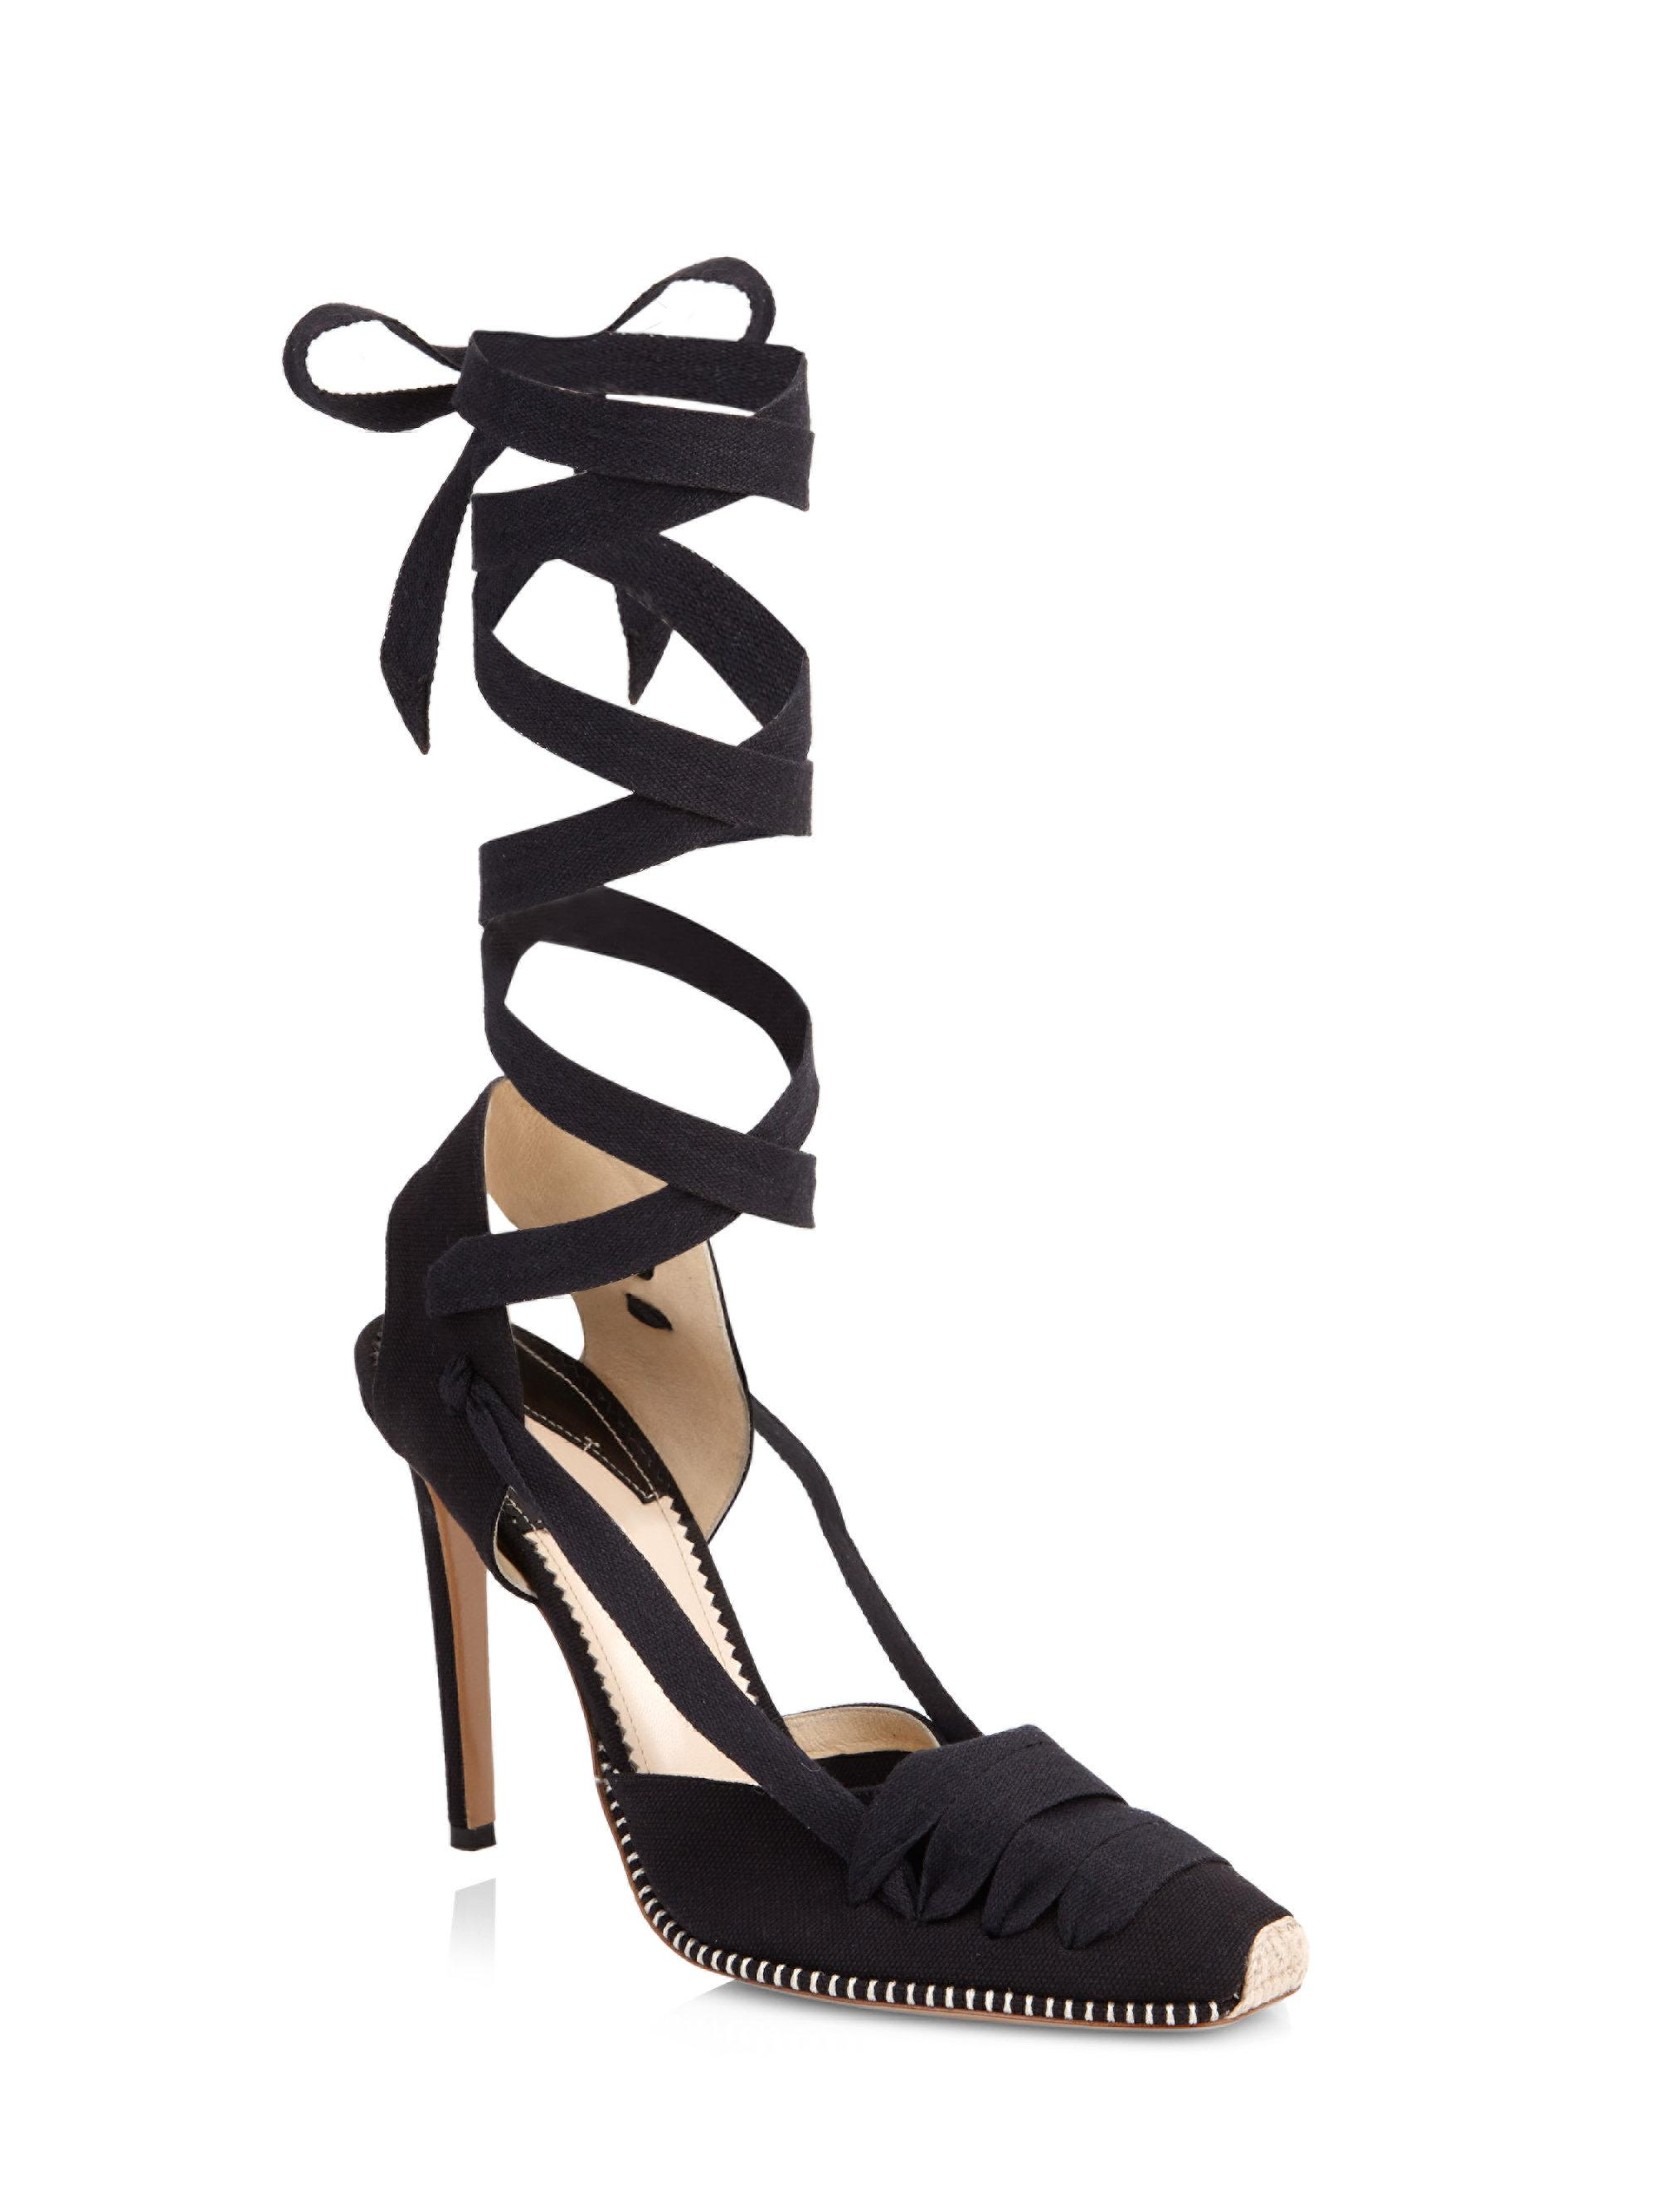 Altuzarra. Women's Black D'orsay Espadrille Stiletto Heel Sandals